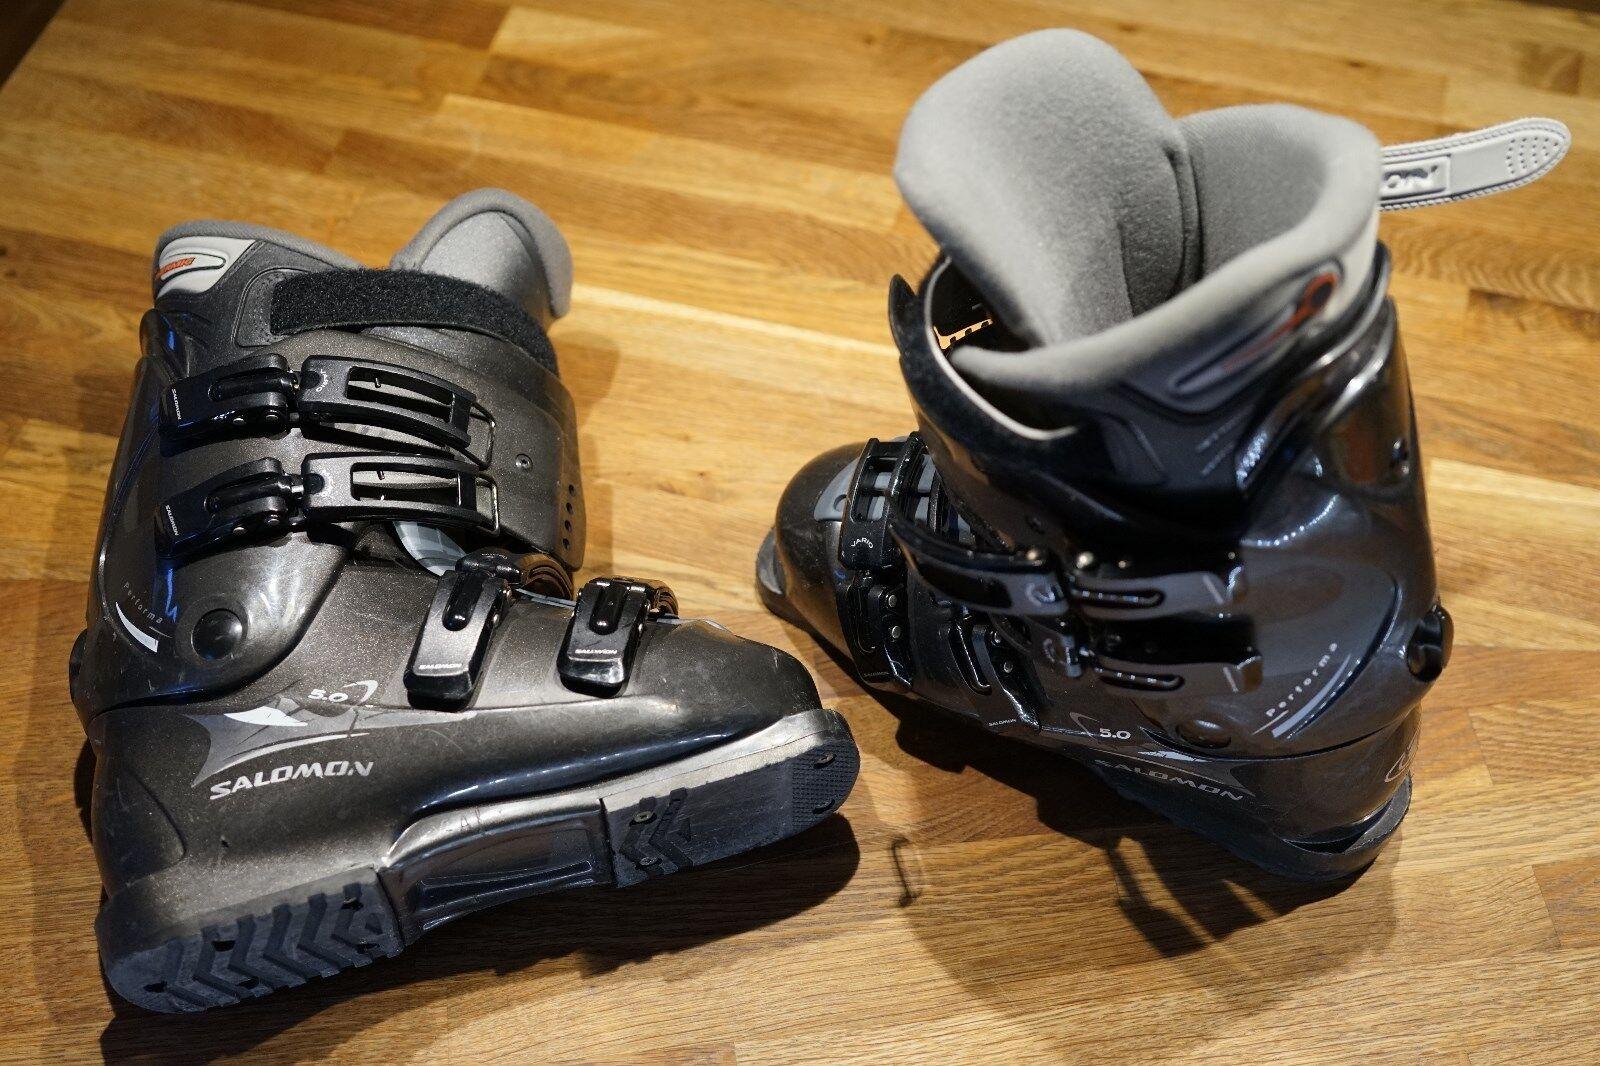 Ski-Stiefel -Schuhe SALOMON Performa 5.0 ca. 38 293mm 250 265 DX- TOP gepflegt